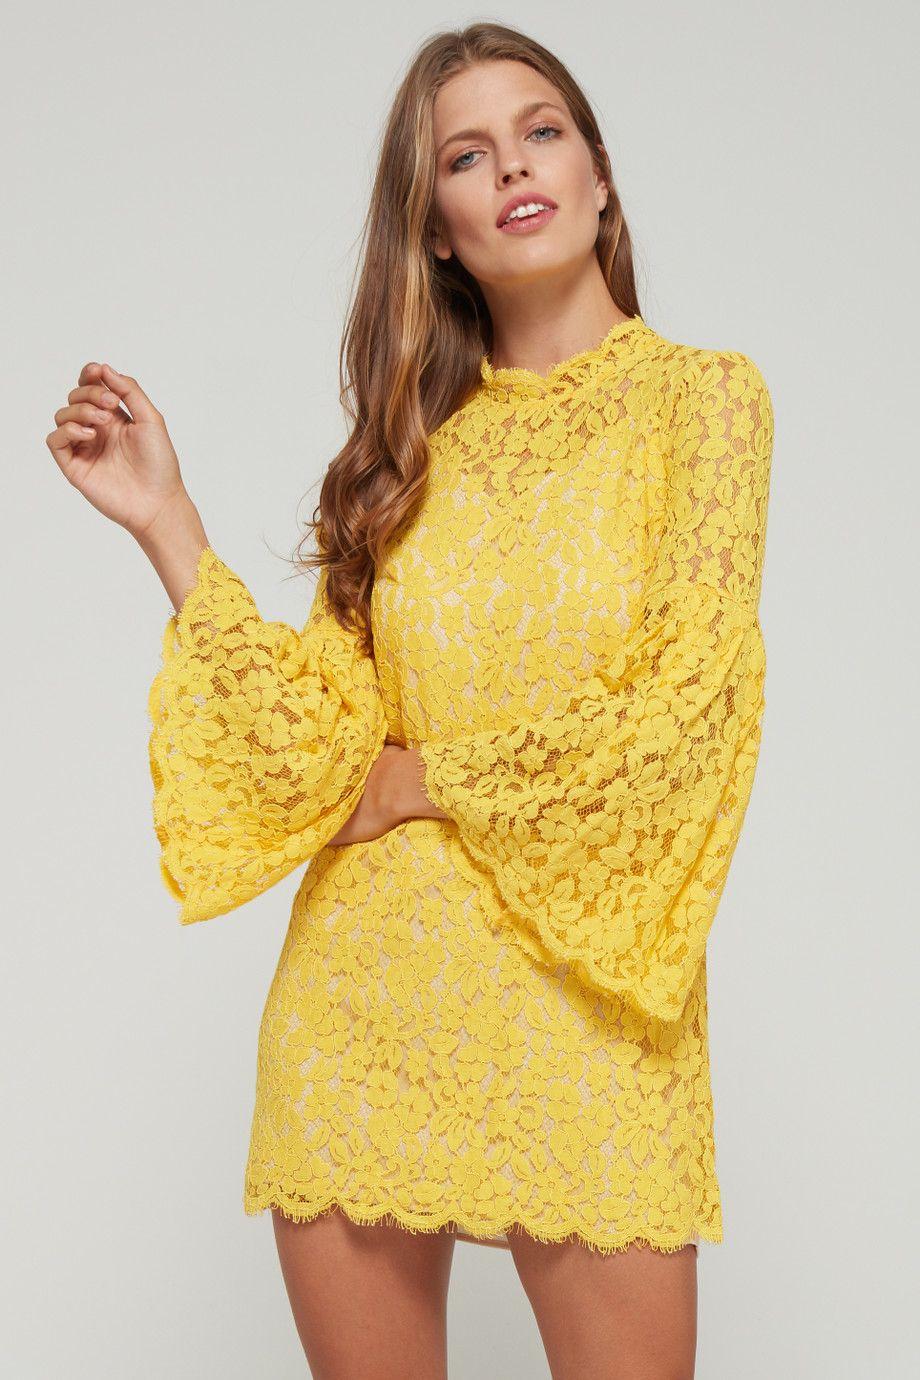 فستان دانتيل طويل بفتحة أمامية مميزة وكشكش Teenage Girls Dresses Maxi Dress Clothes For Women